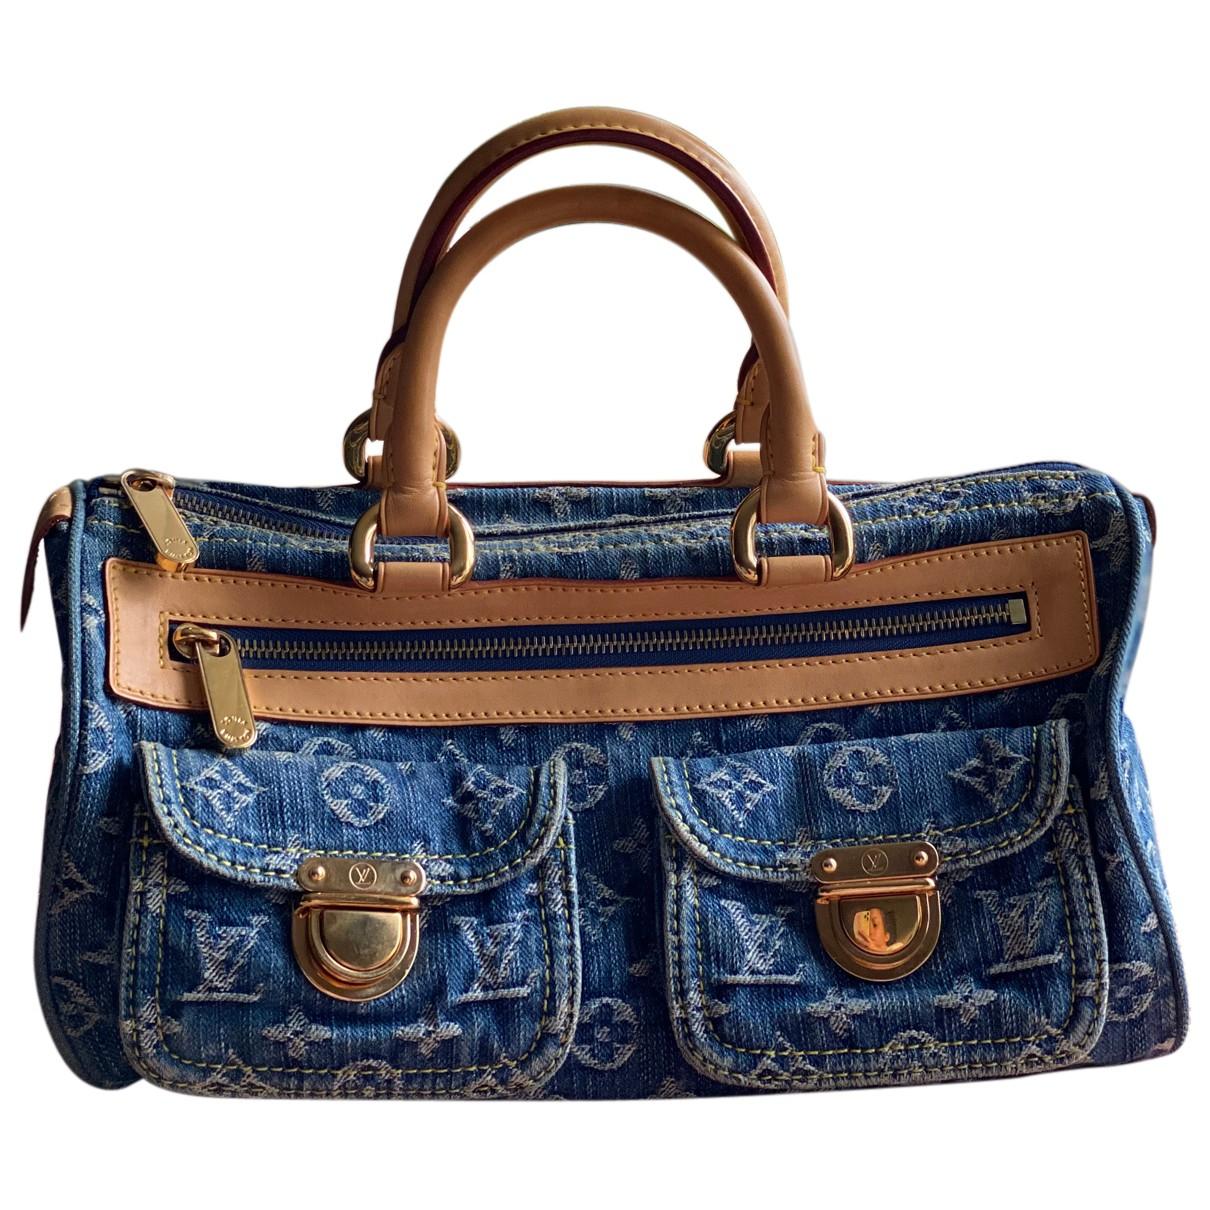 Louis Vuitton - Sac a main Neo speedy pour femme en denim - bleu